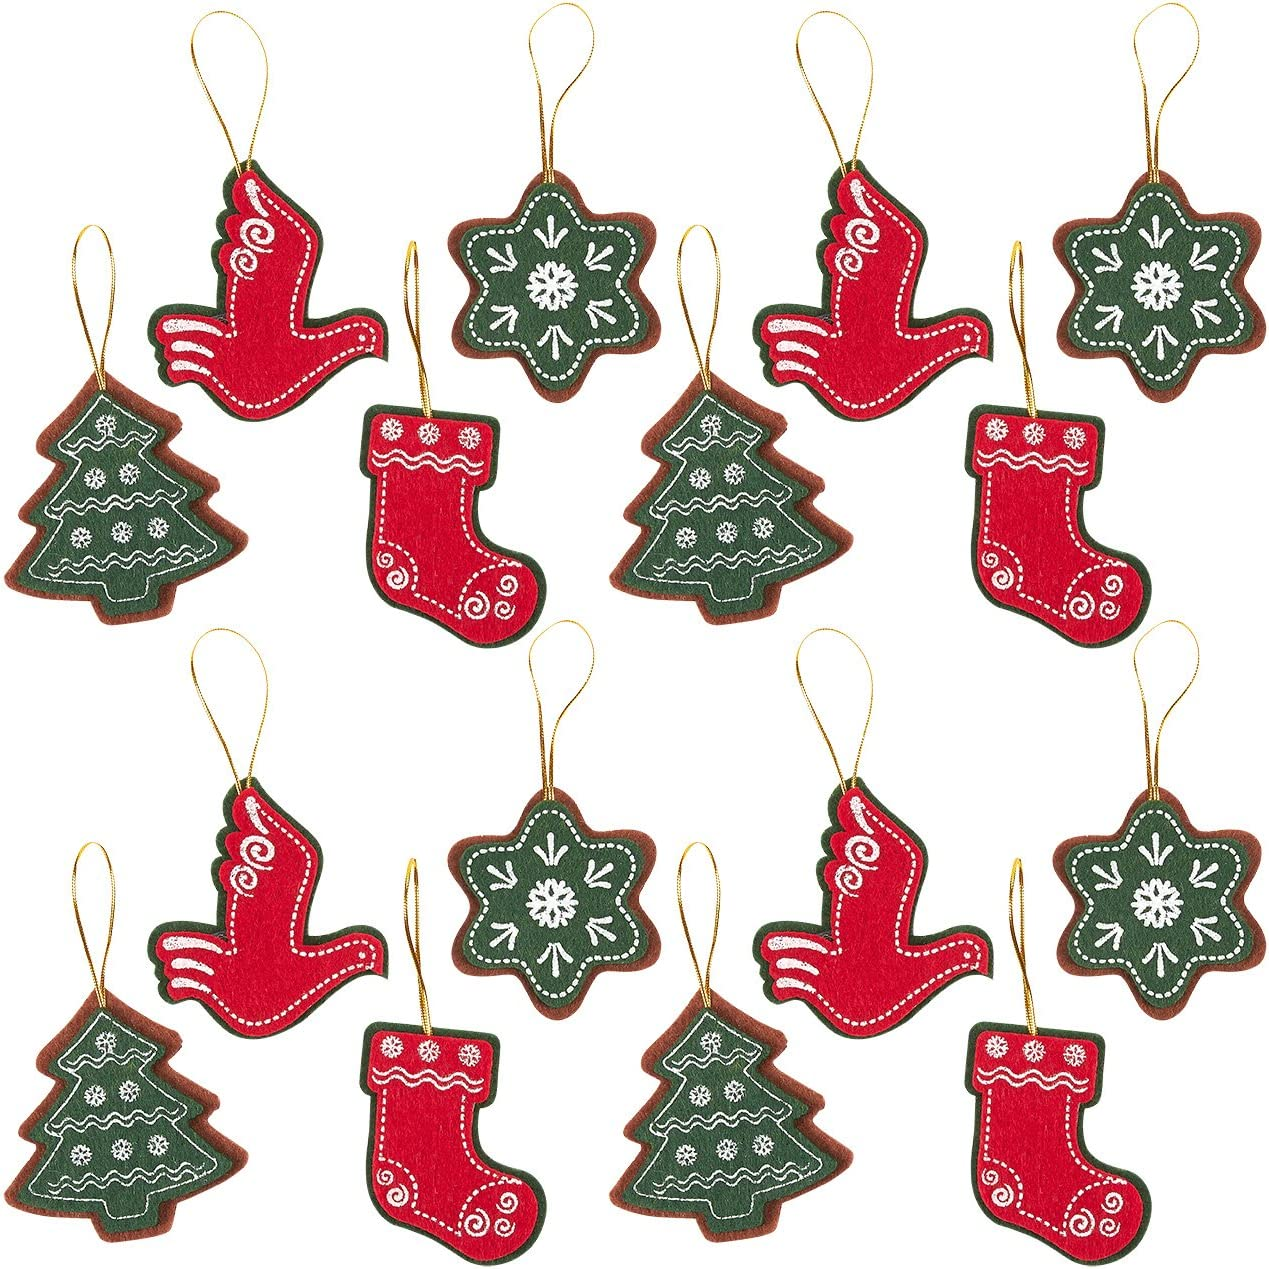 Felt Christmas Ornament, Holiday Ornaments Set 21 Designs, 21 Pack